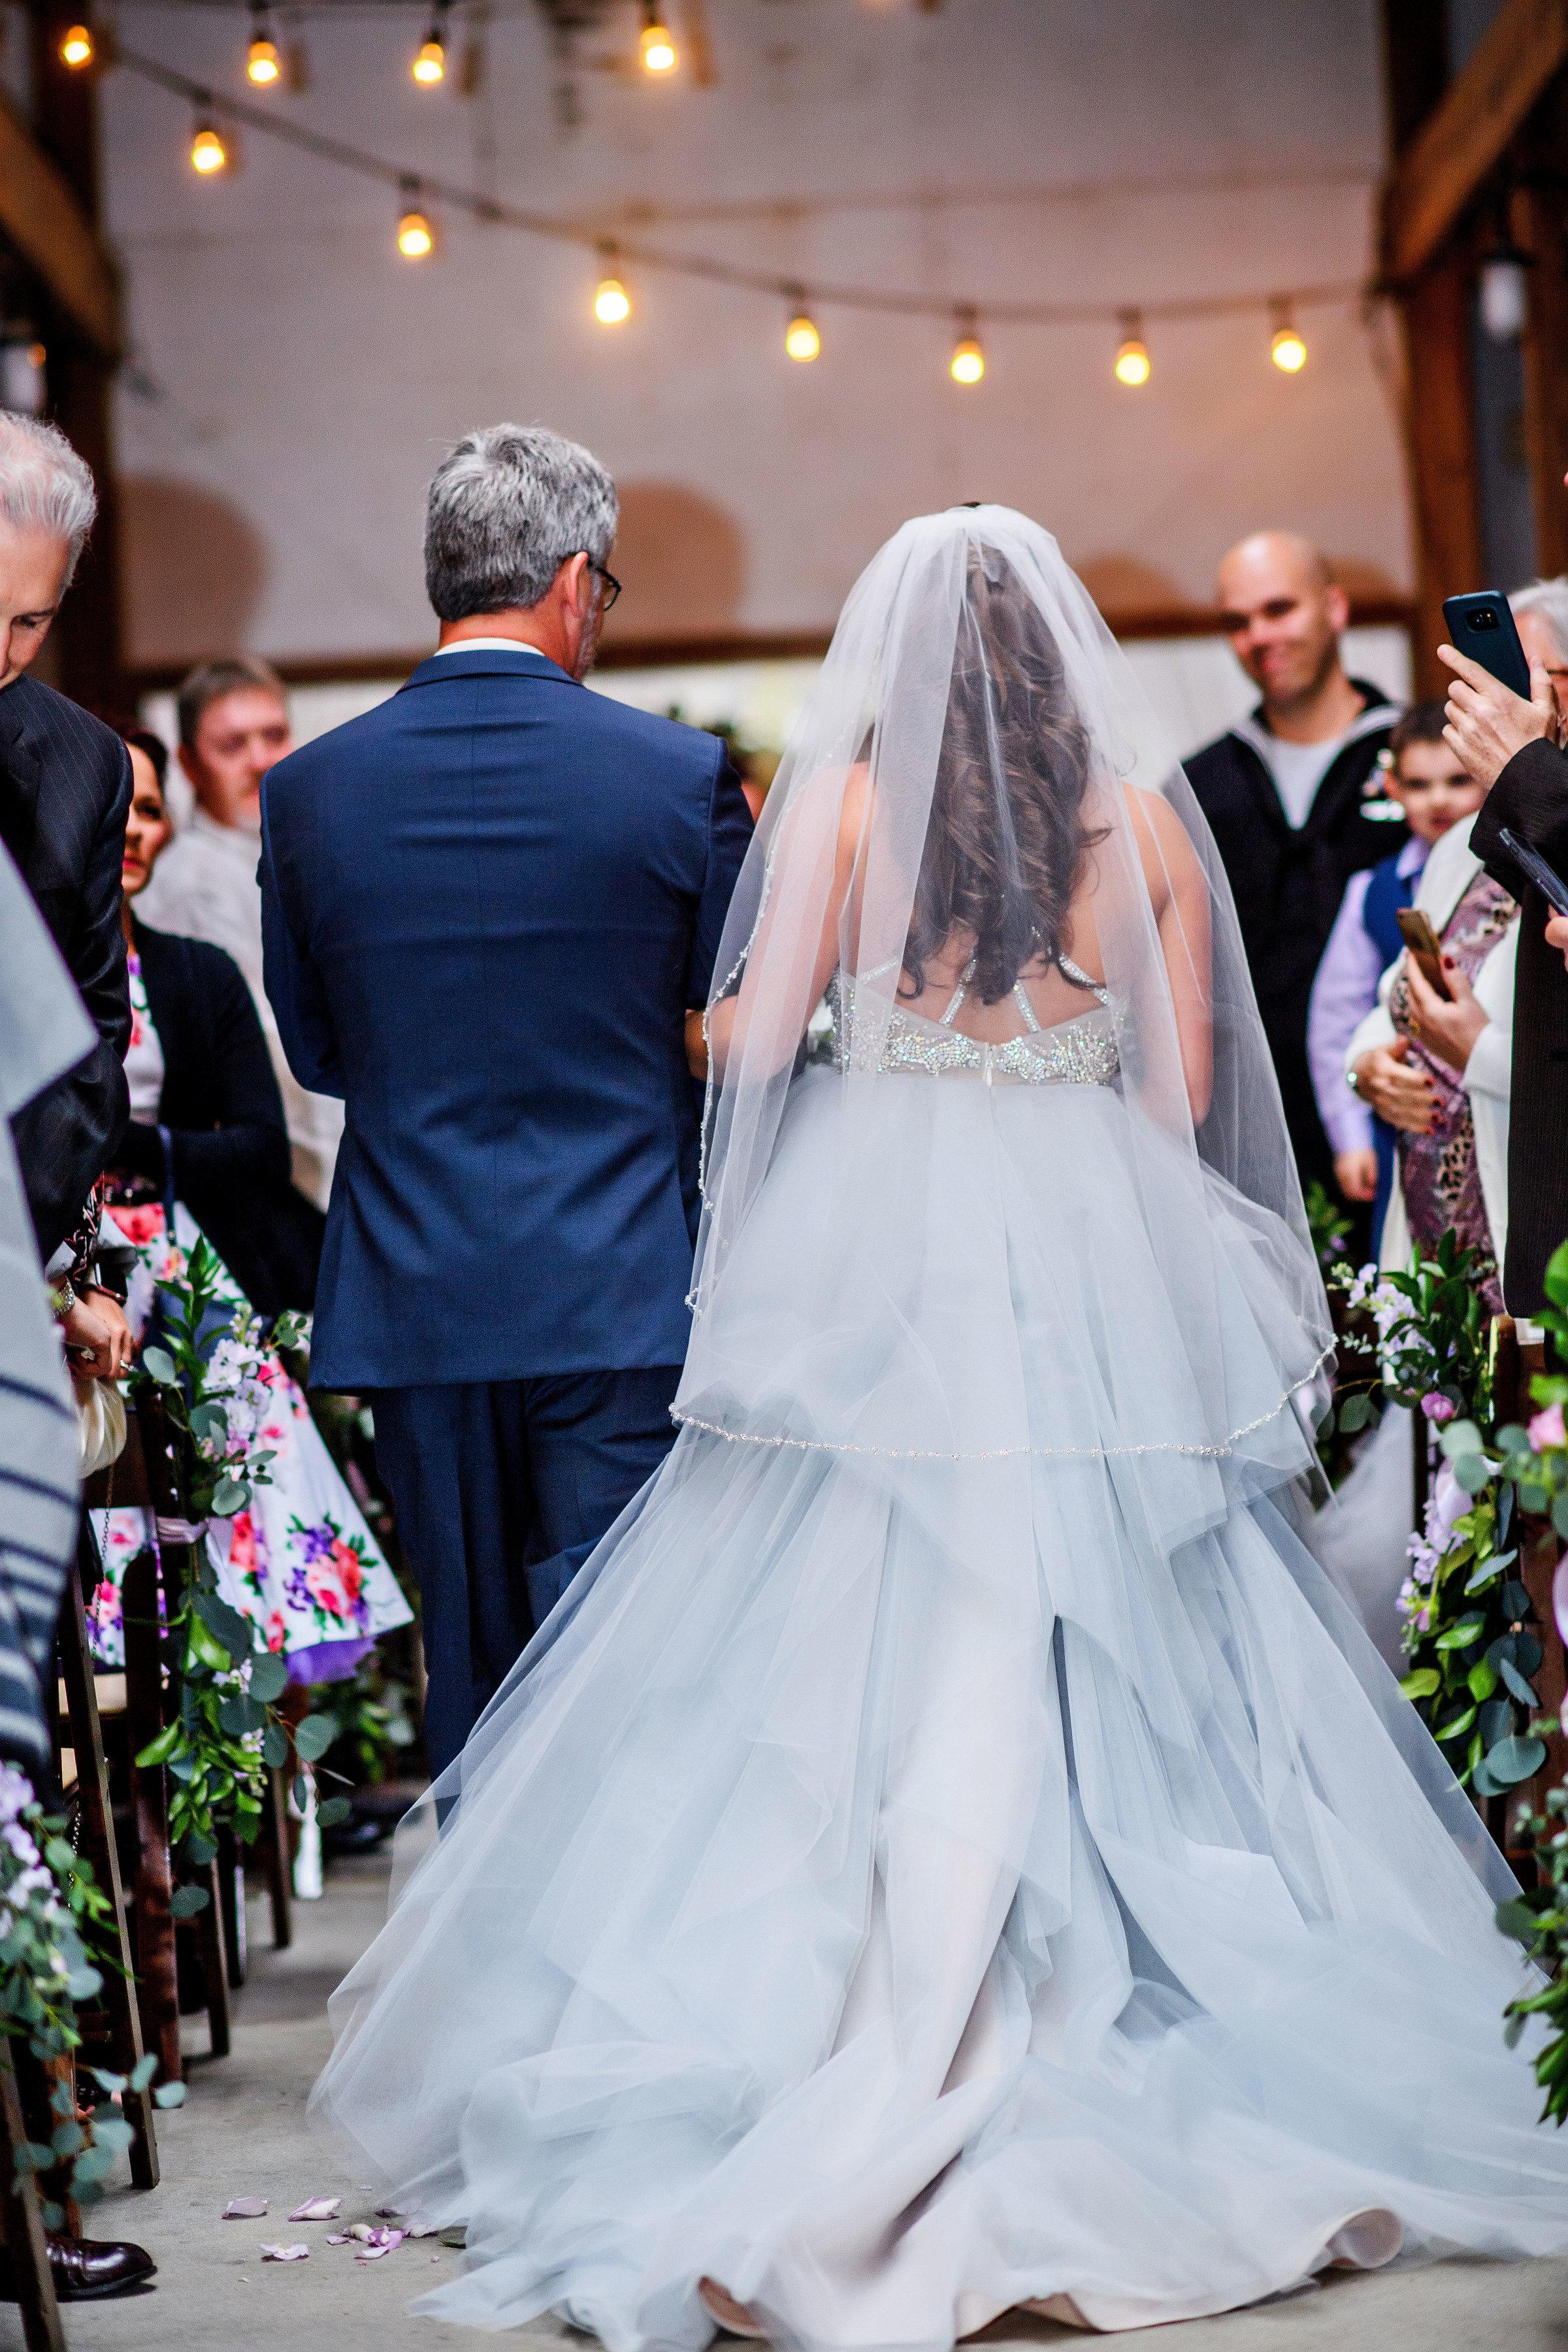 brookeandalex-wedding-513.jpg